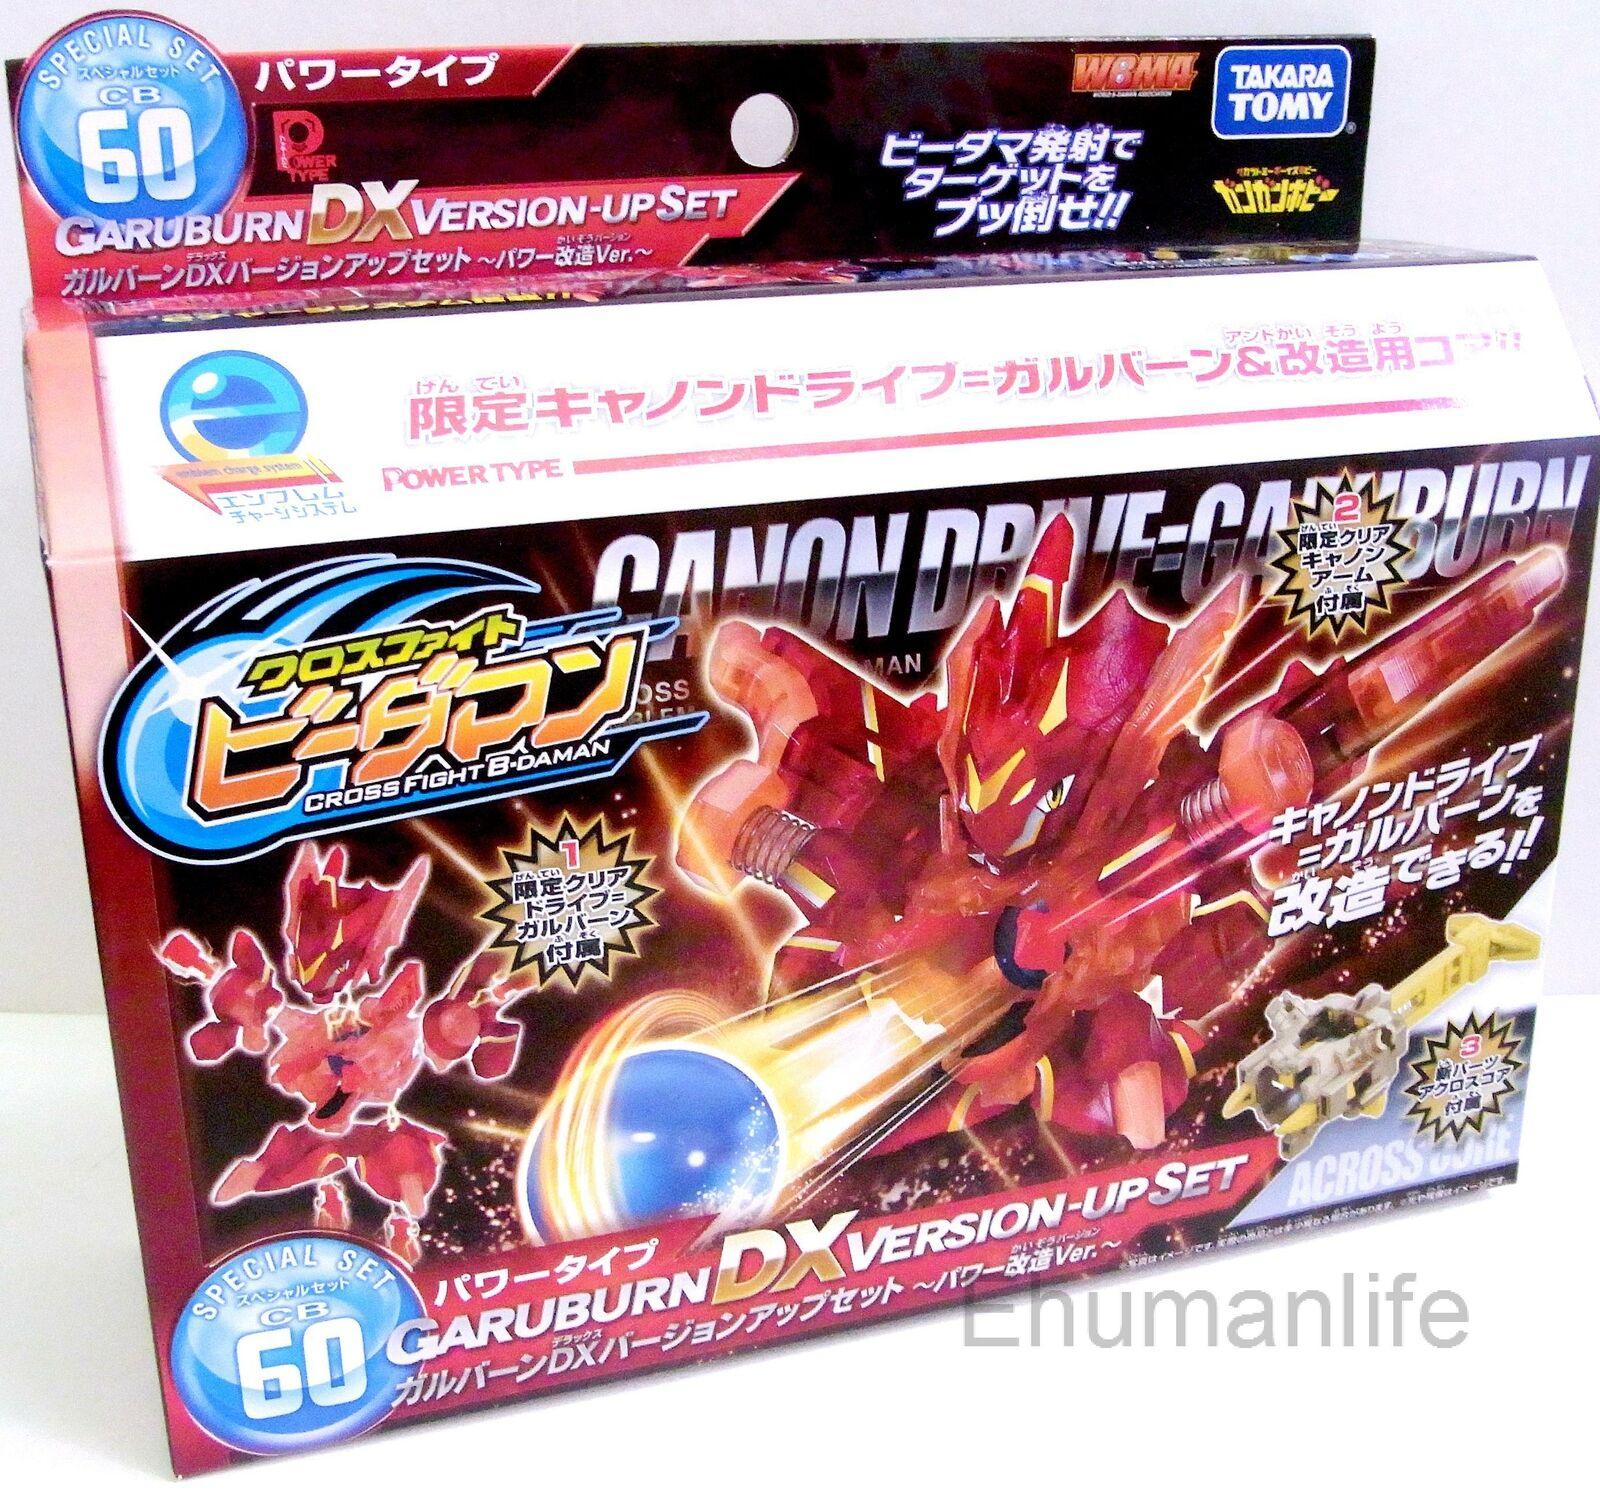 Takara Tomy Corss Fight B-Daman CB-78 Gatling Deathshell F0199 Original